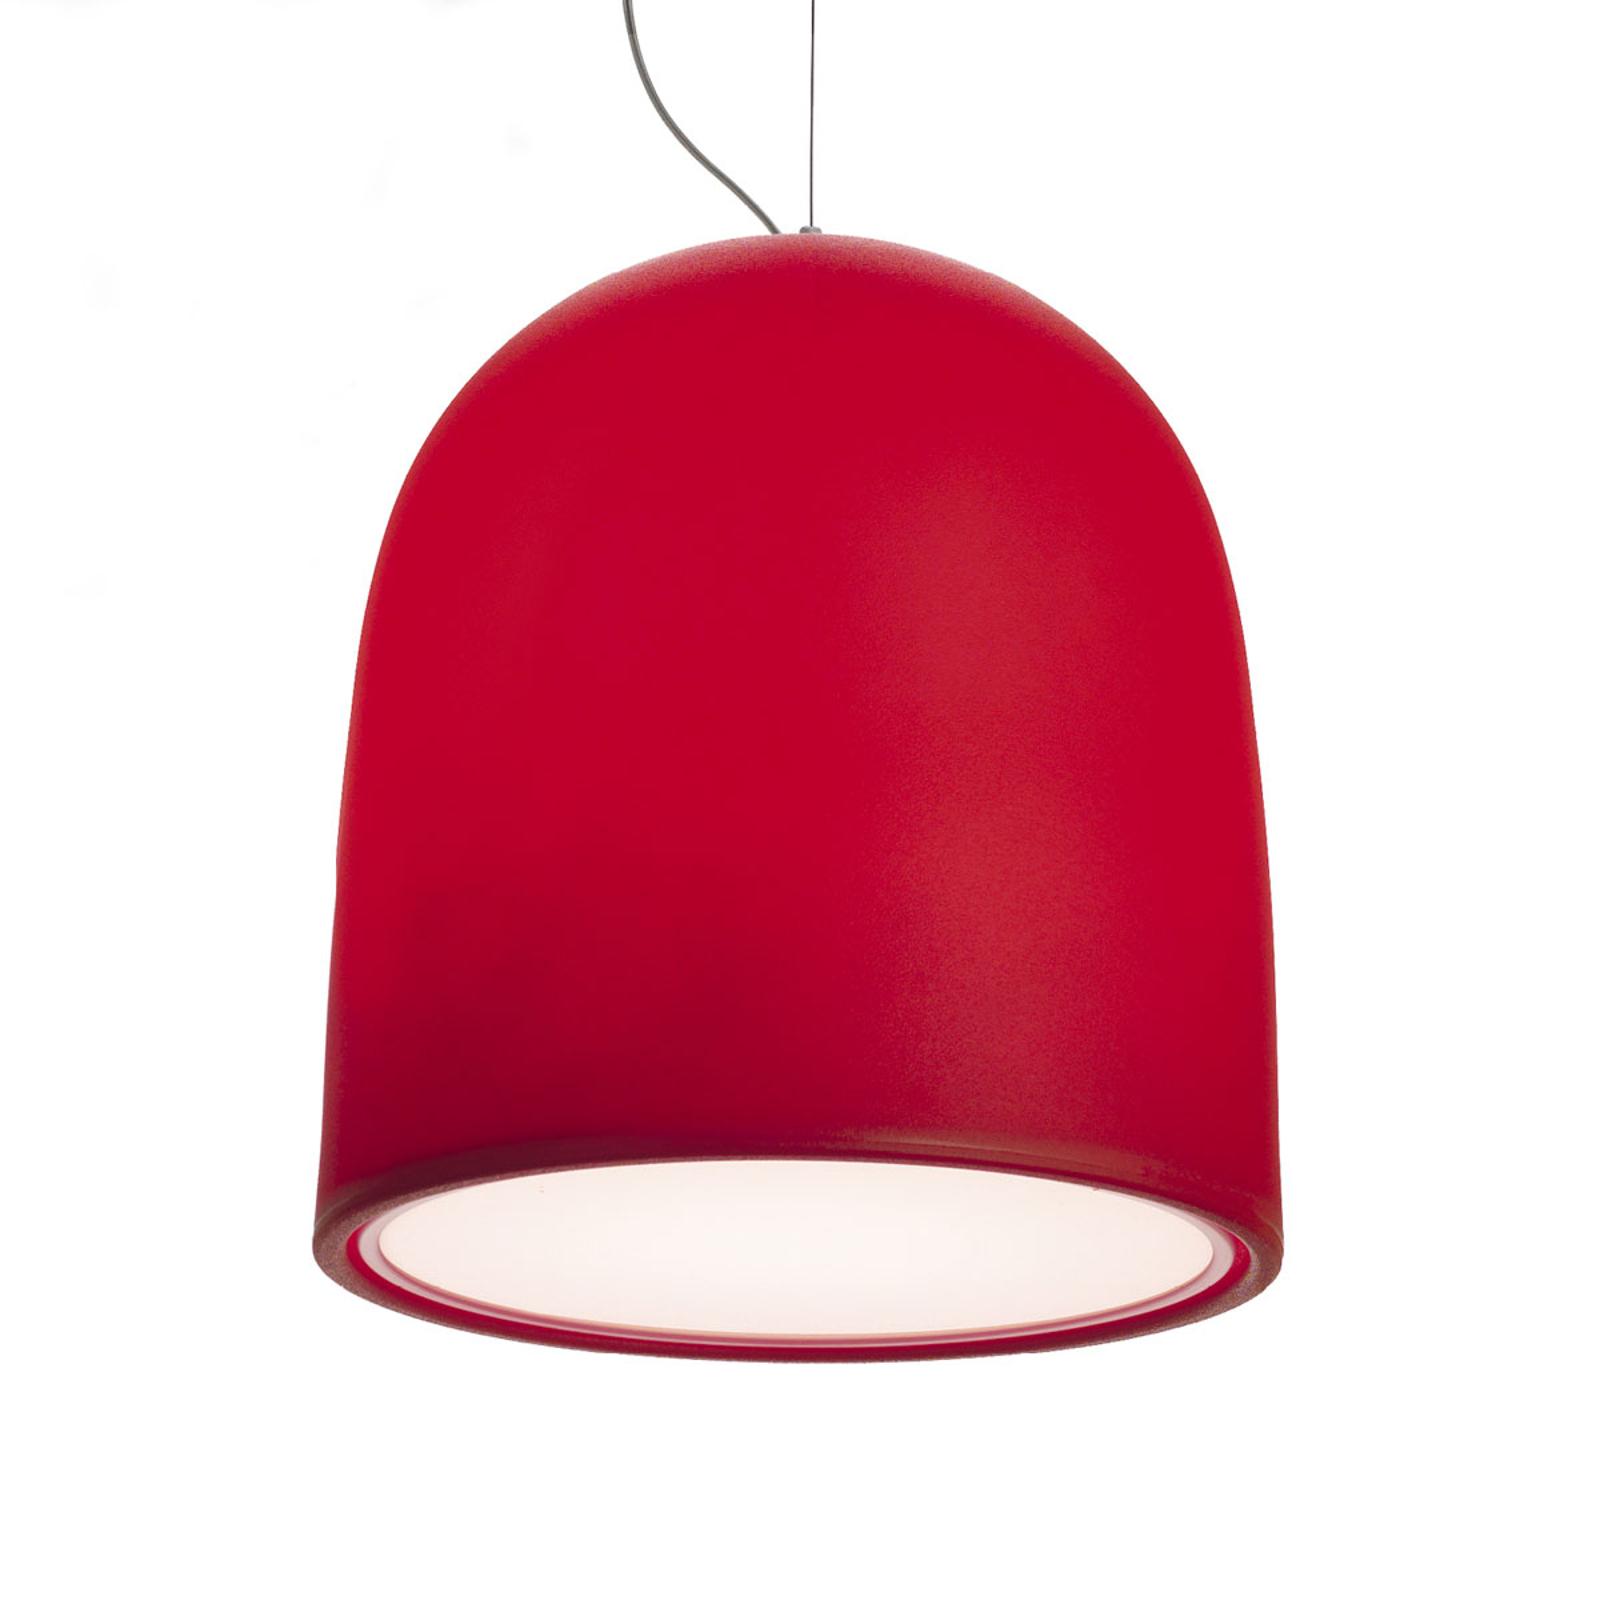 Modo Luce Campanone hanglamp Ø 51 cm rood